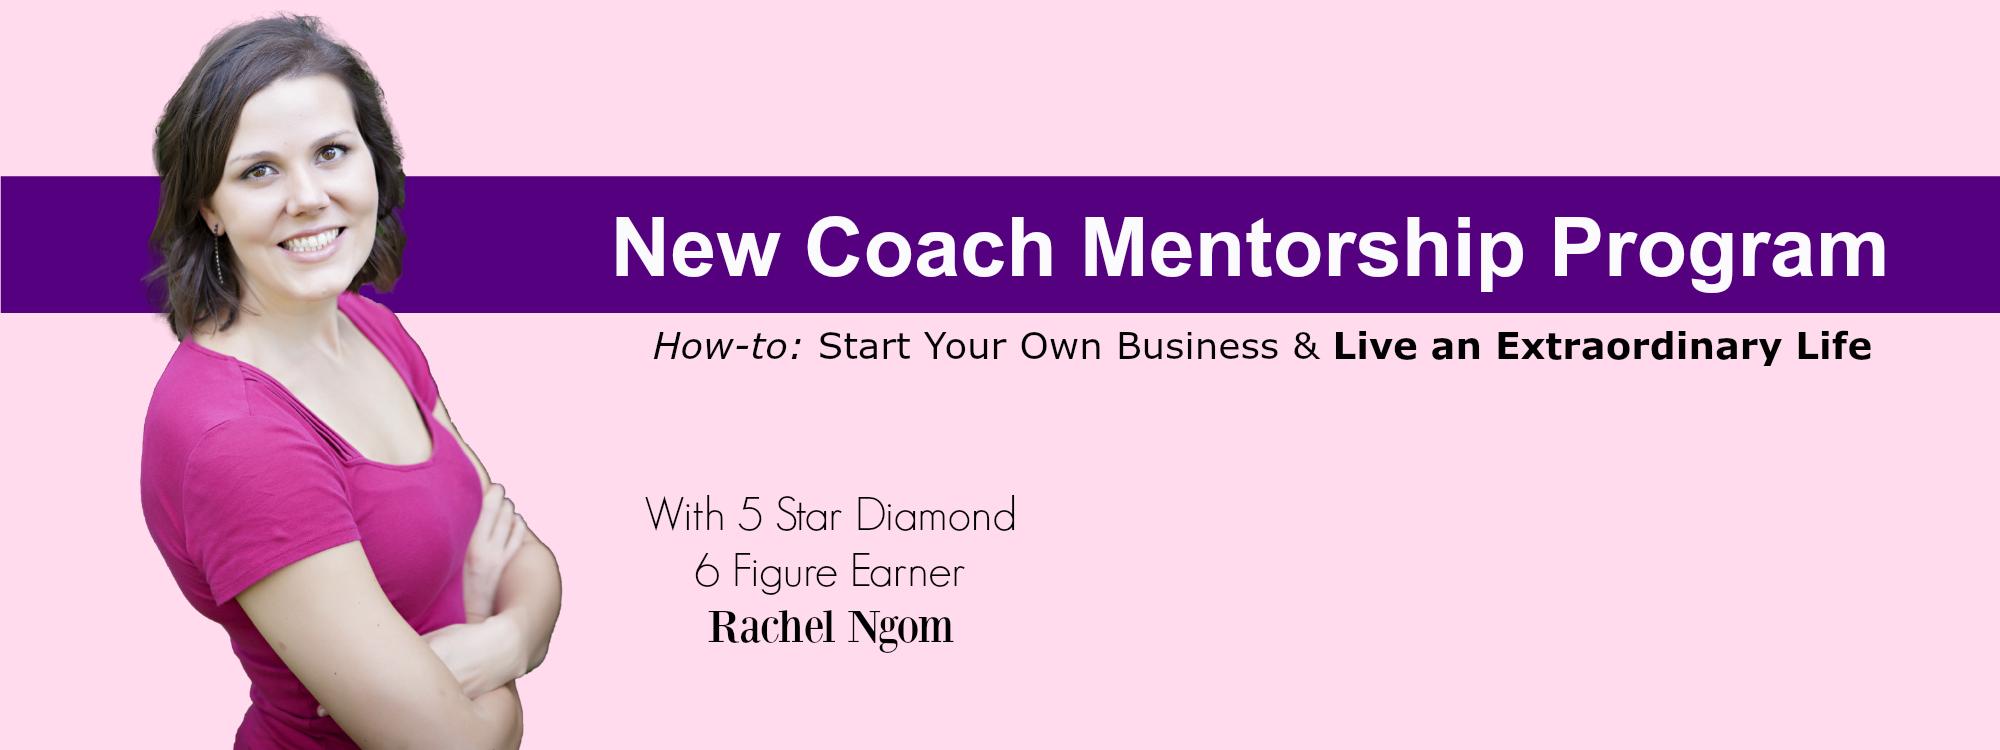 new coach mentorship header